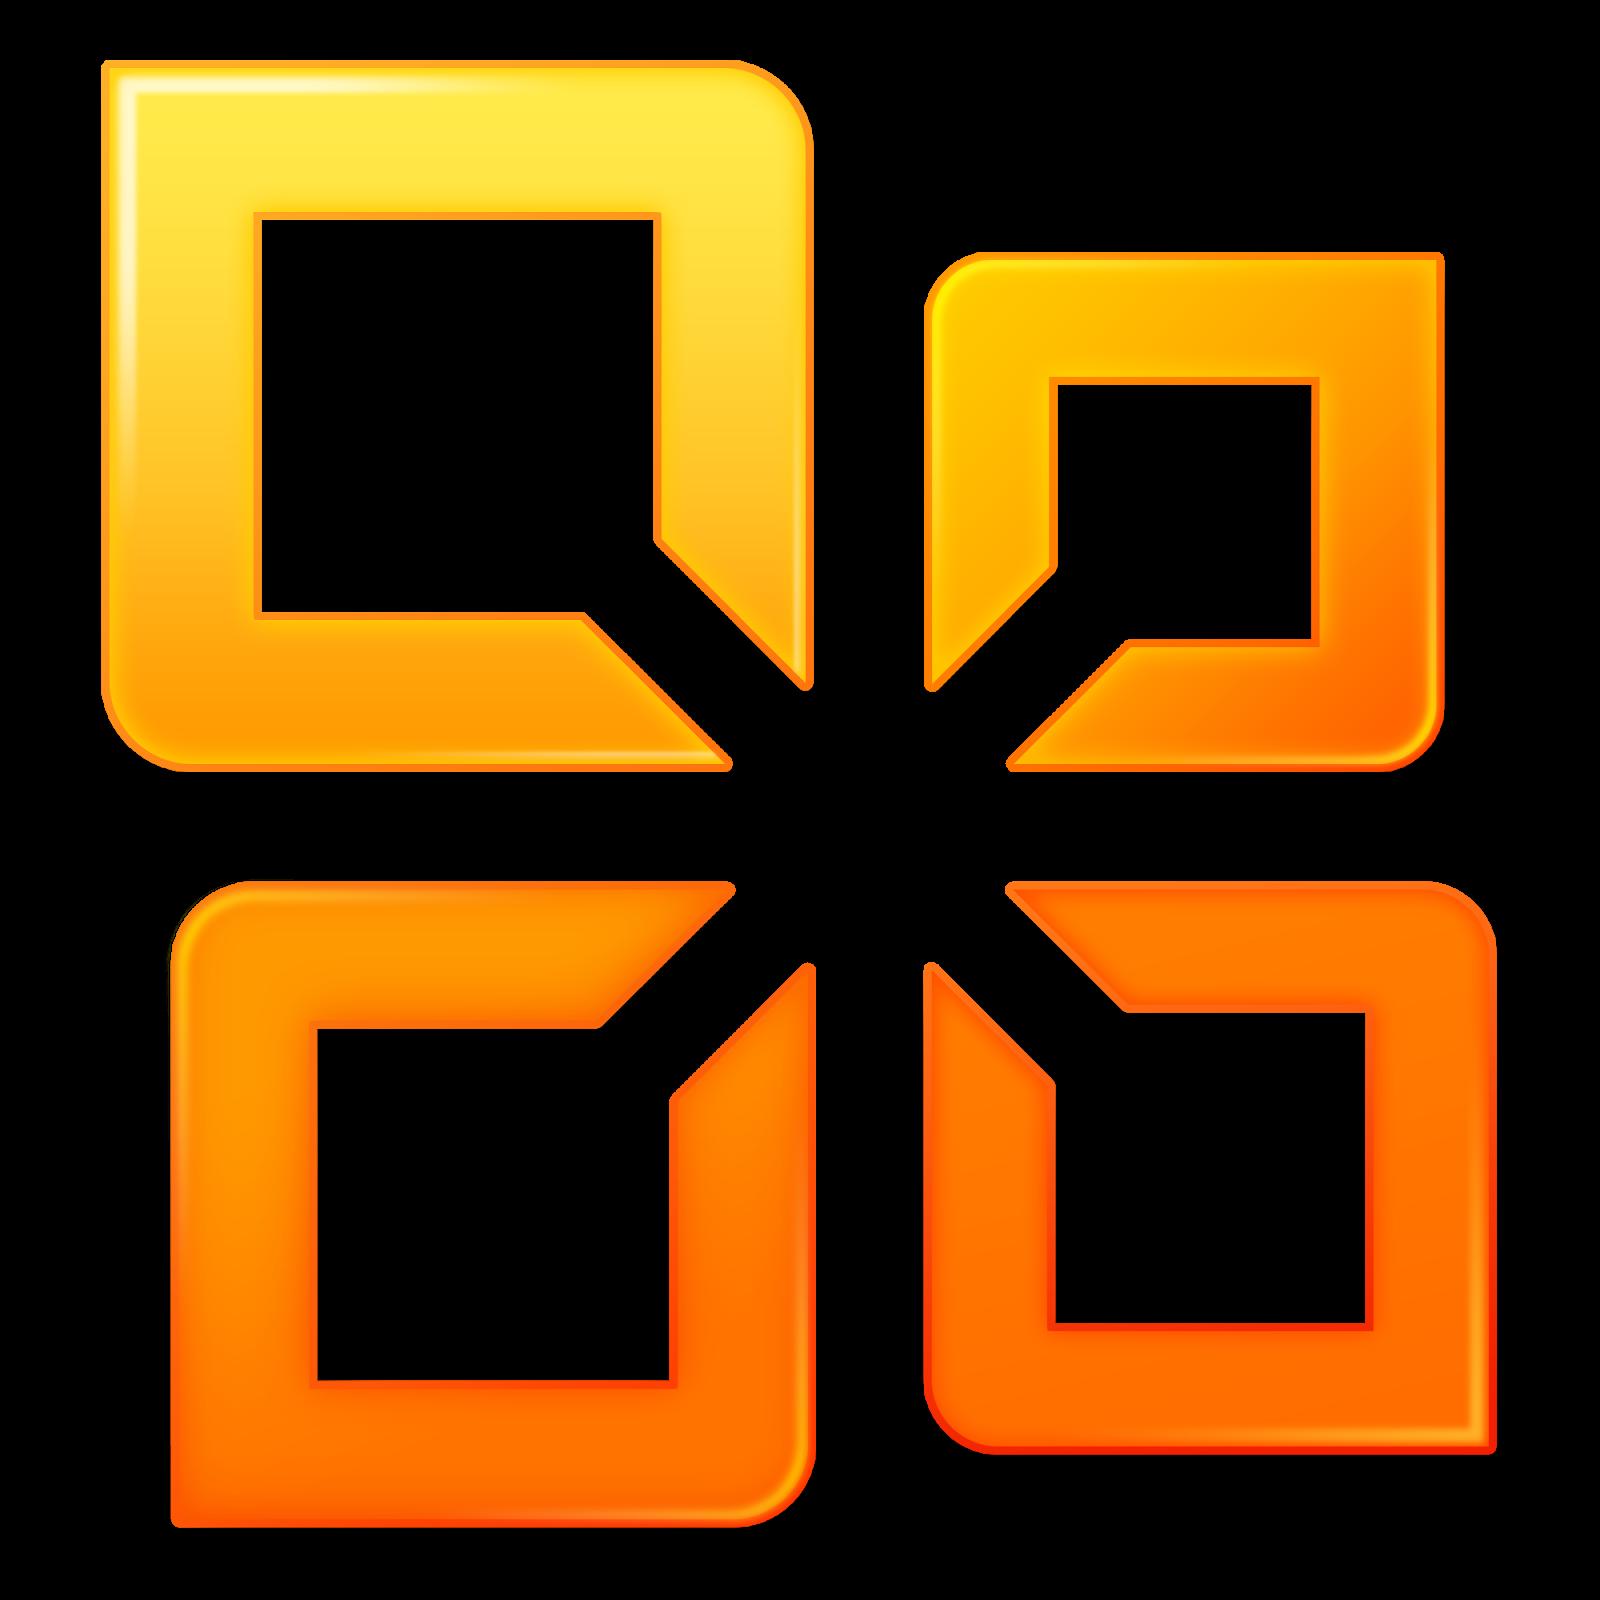 X86x64